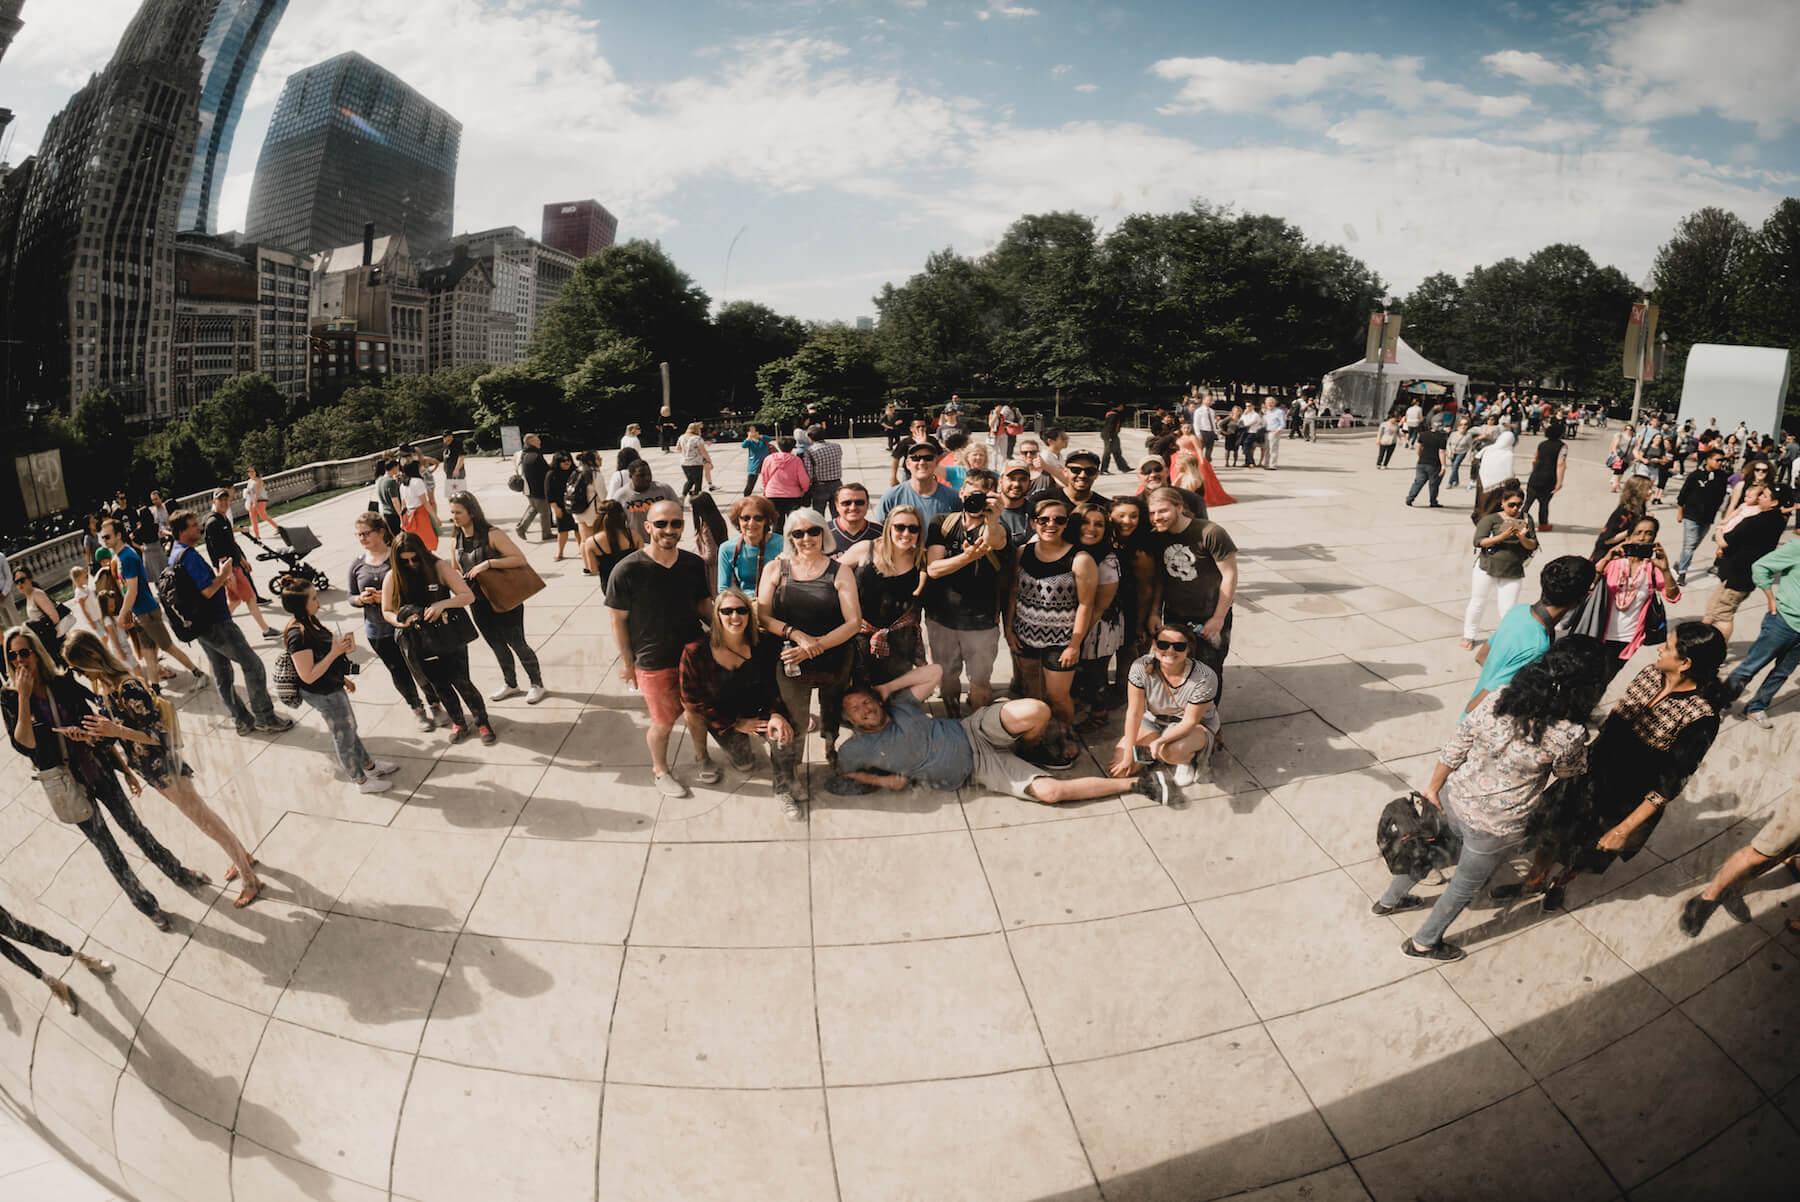 engle-olson-chicago-family-reunion-43.jpg